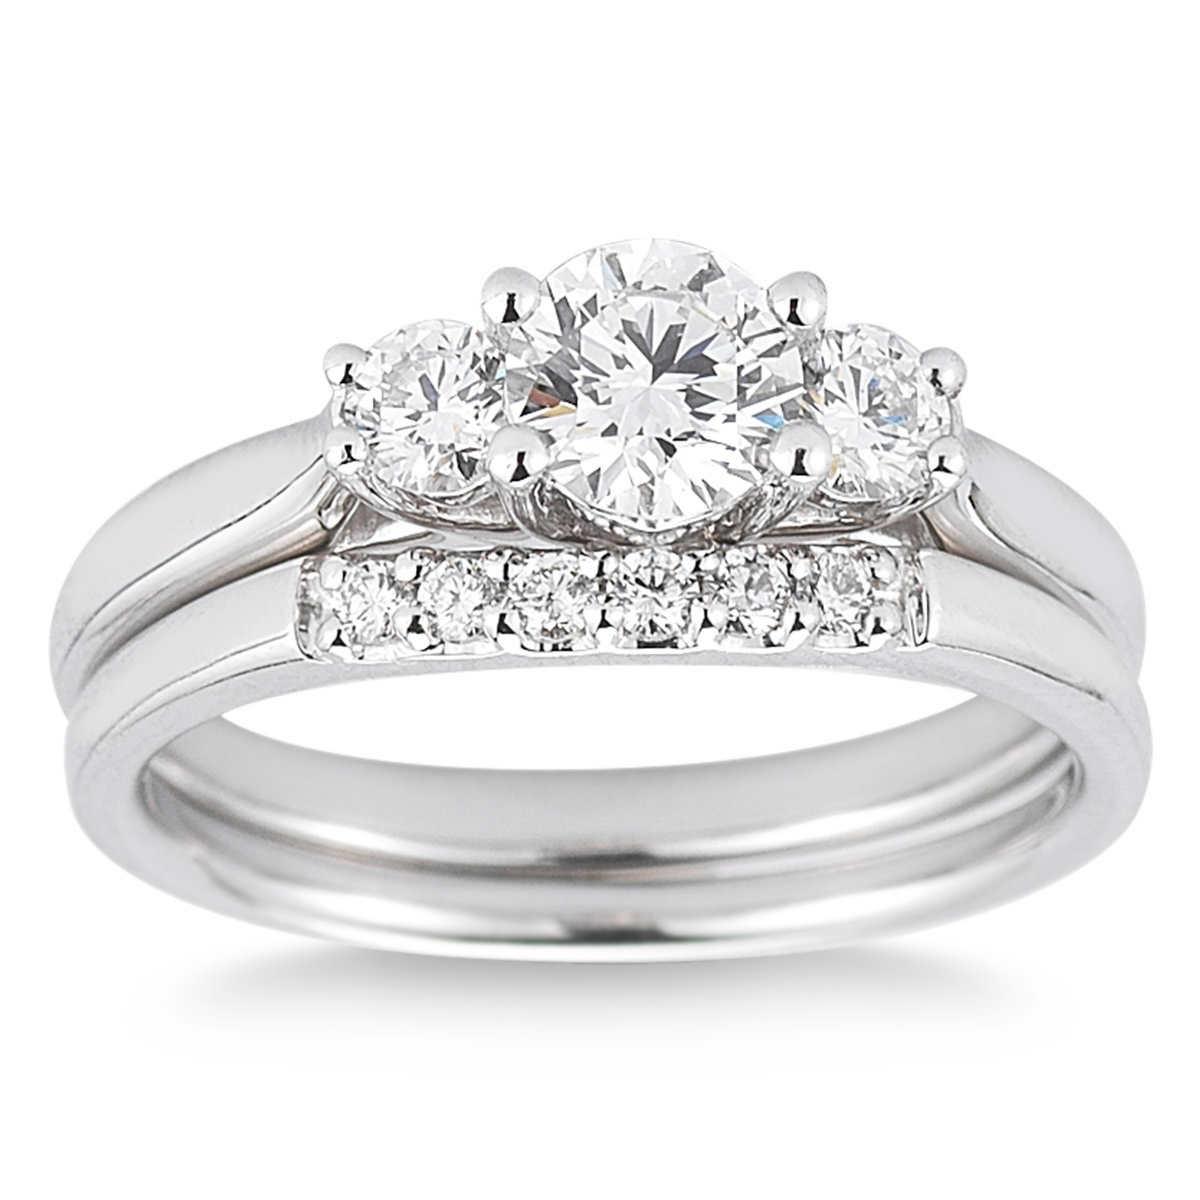 wedding sets wedding set Round Brilliant 1 00 ctw VS2 Clarity I Color Diamond Platinum Three Stone Wedding Set